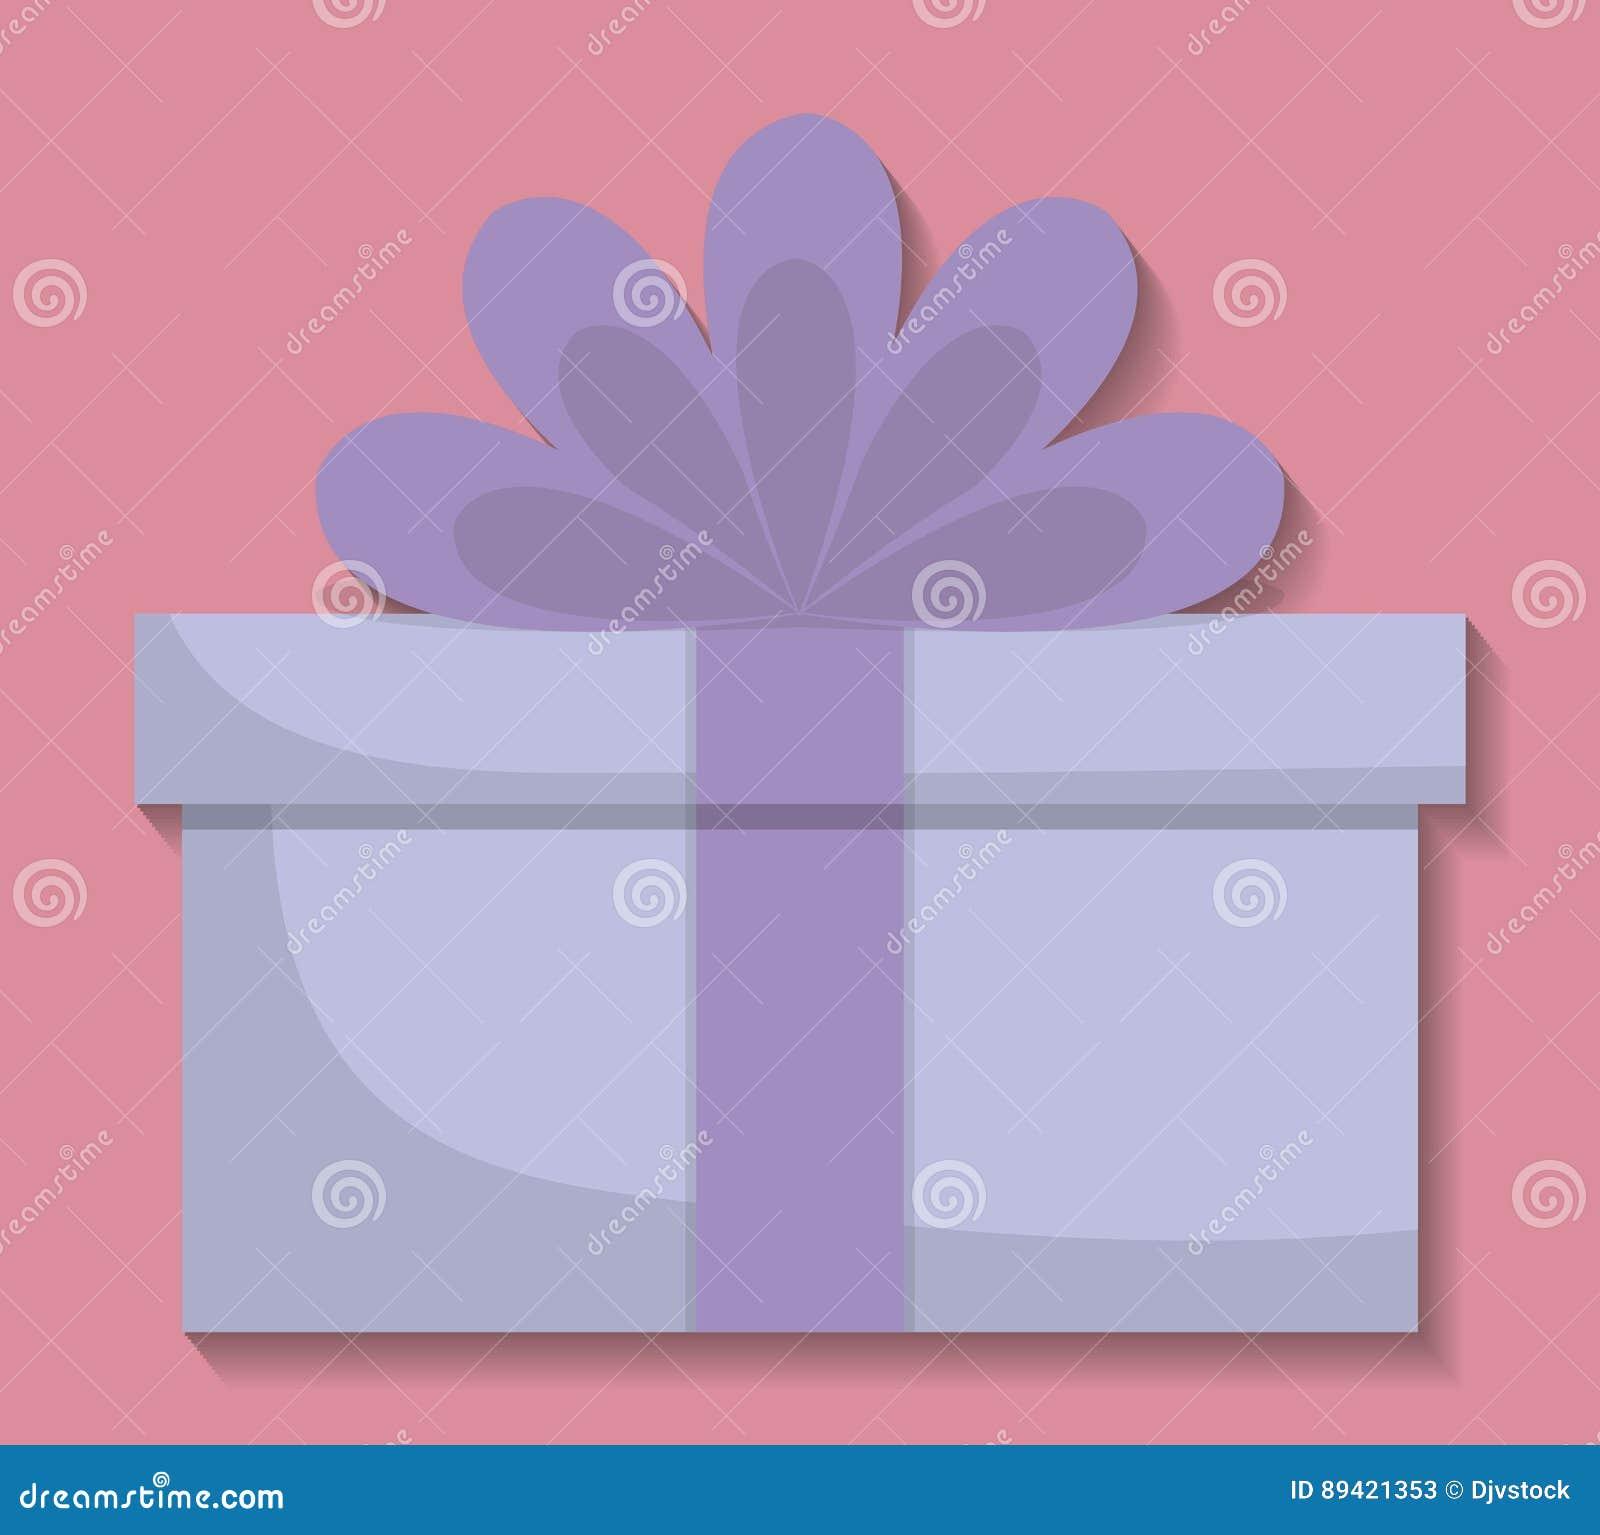 Ícone da caixa de presente